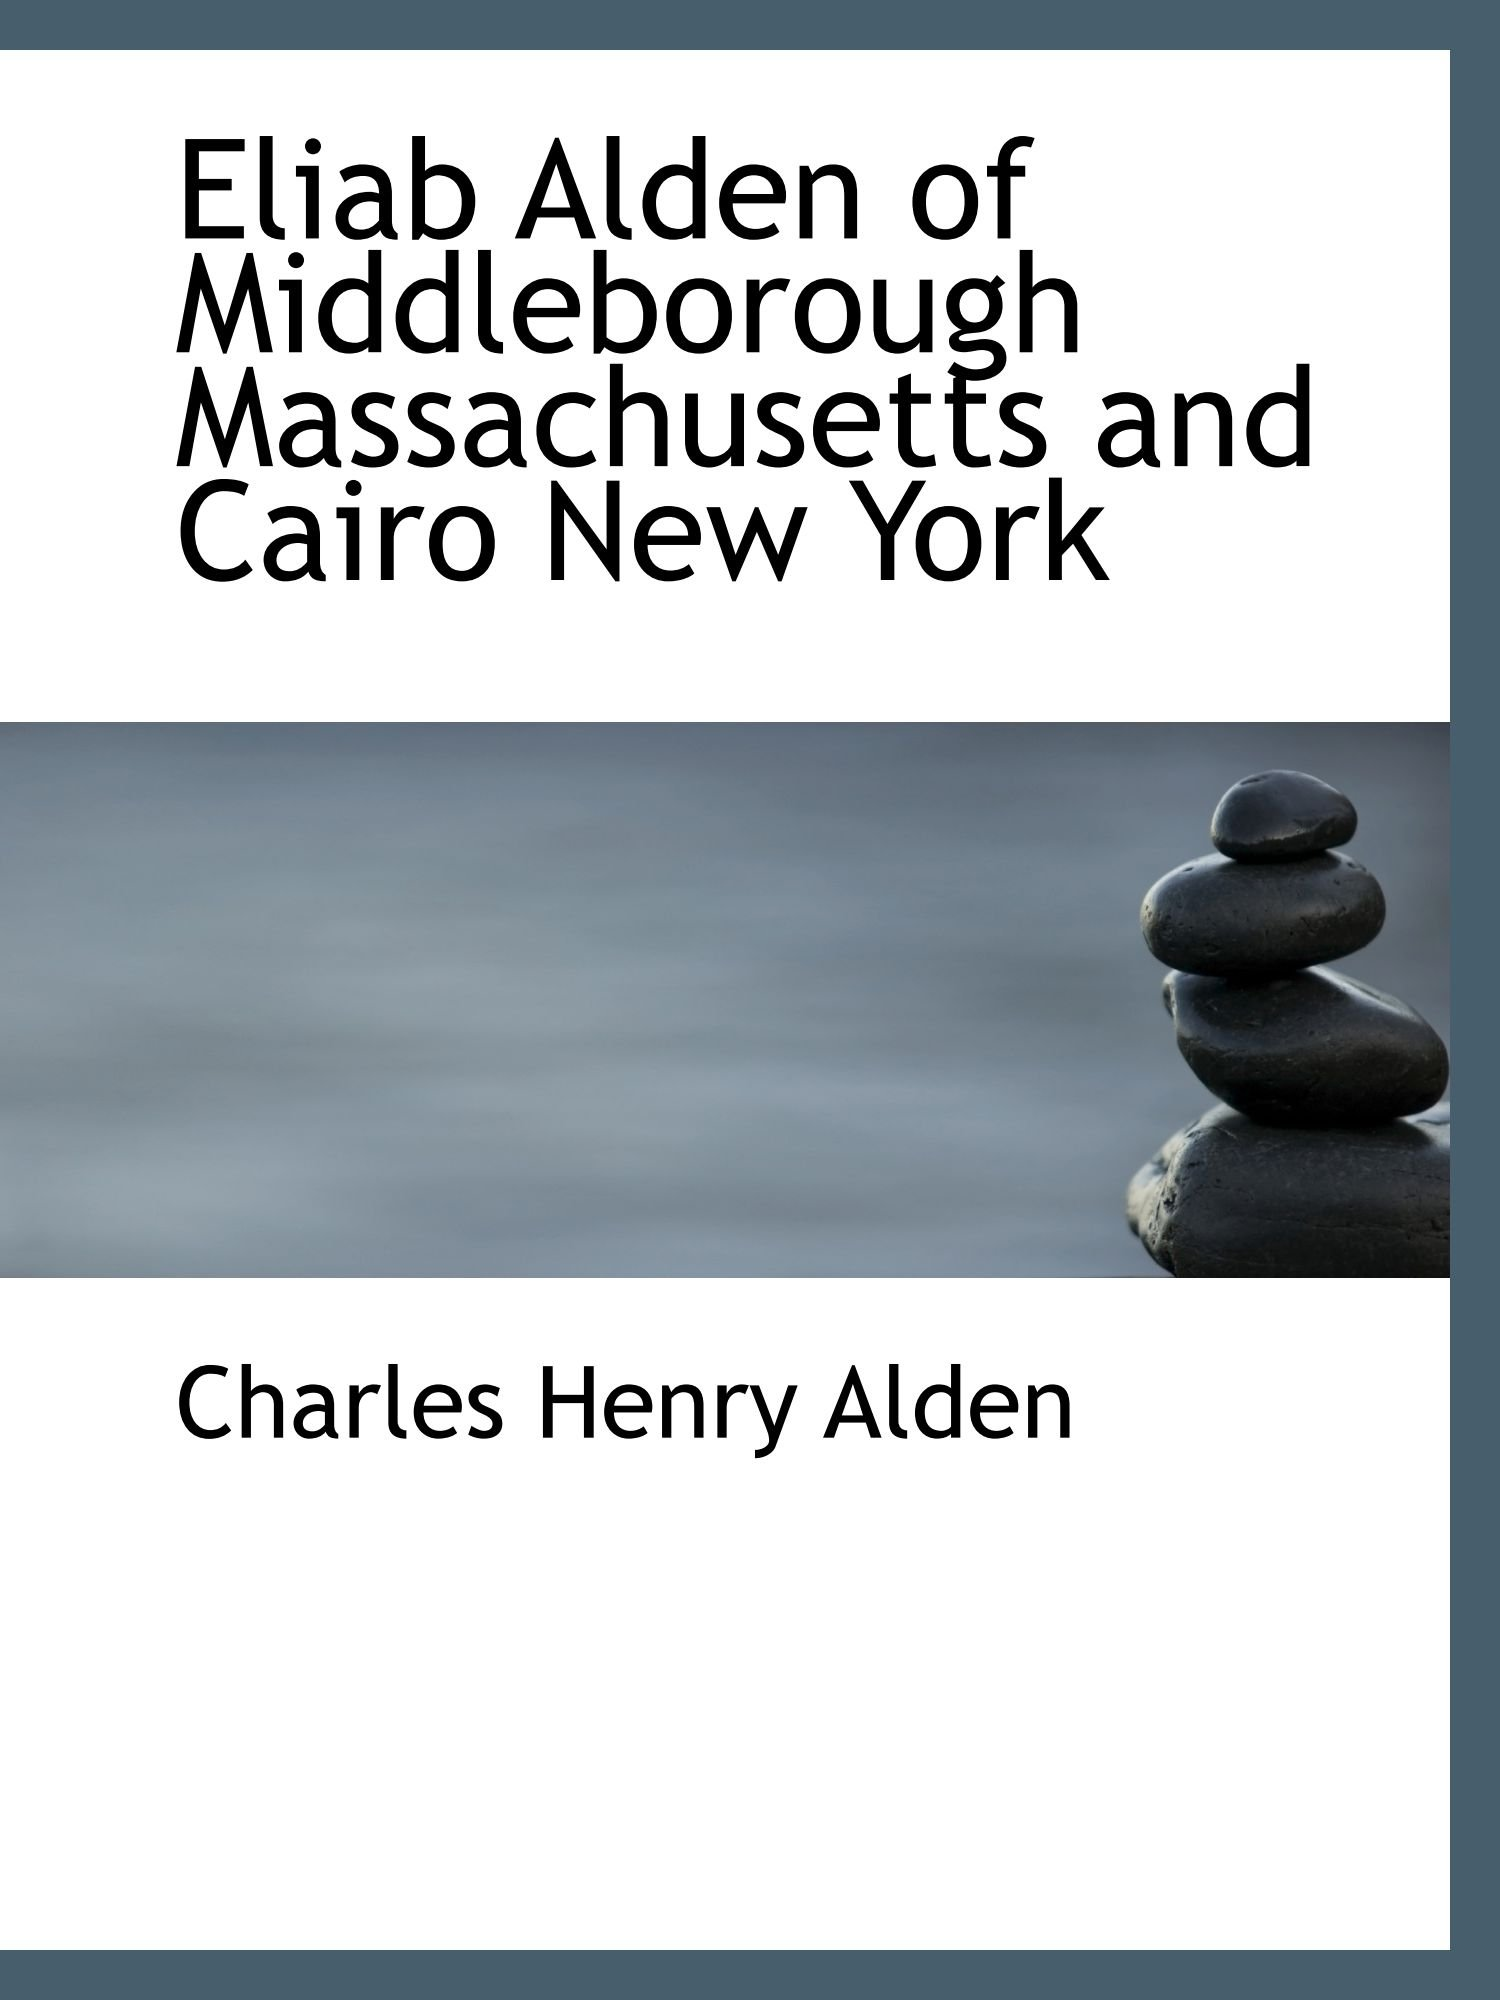 Eliab Alden of Middleborough Massachusetts and Cairo New York ebook